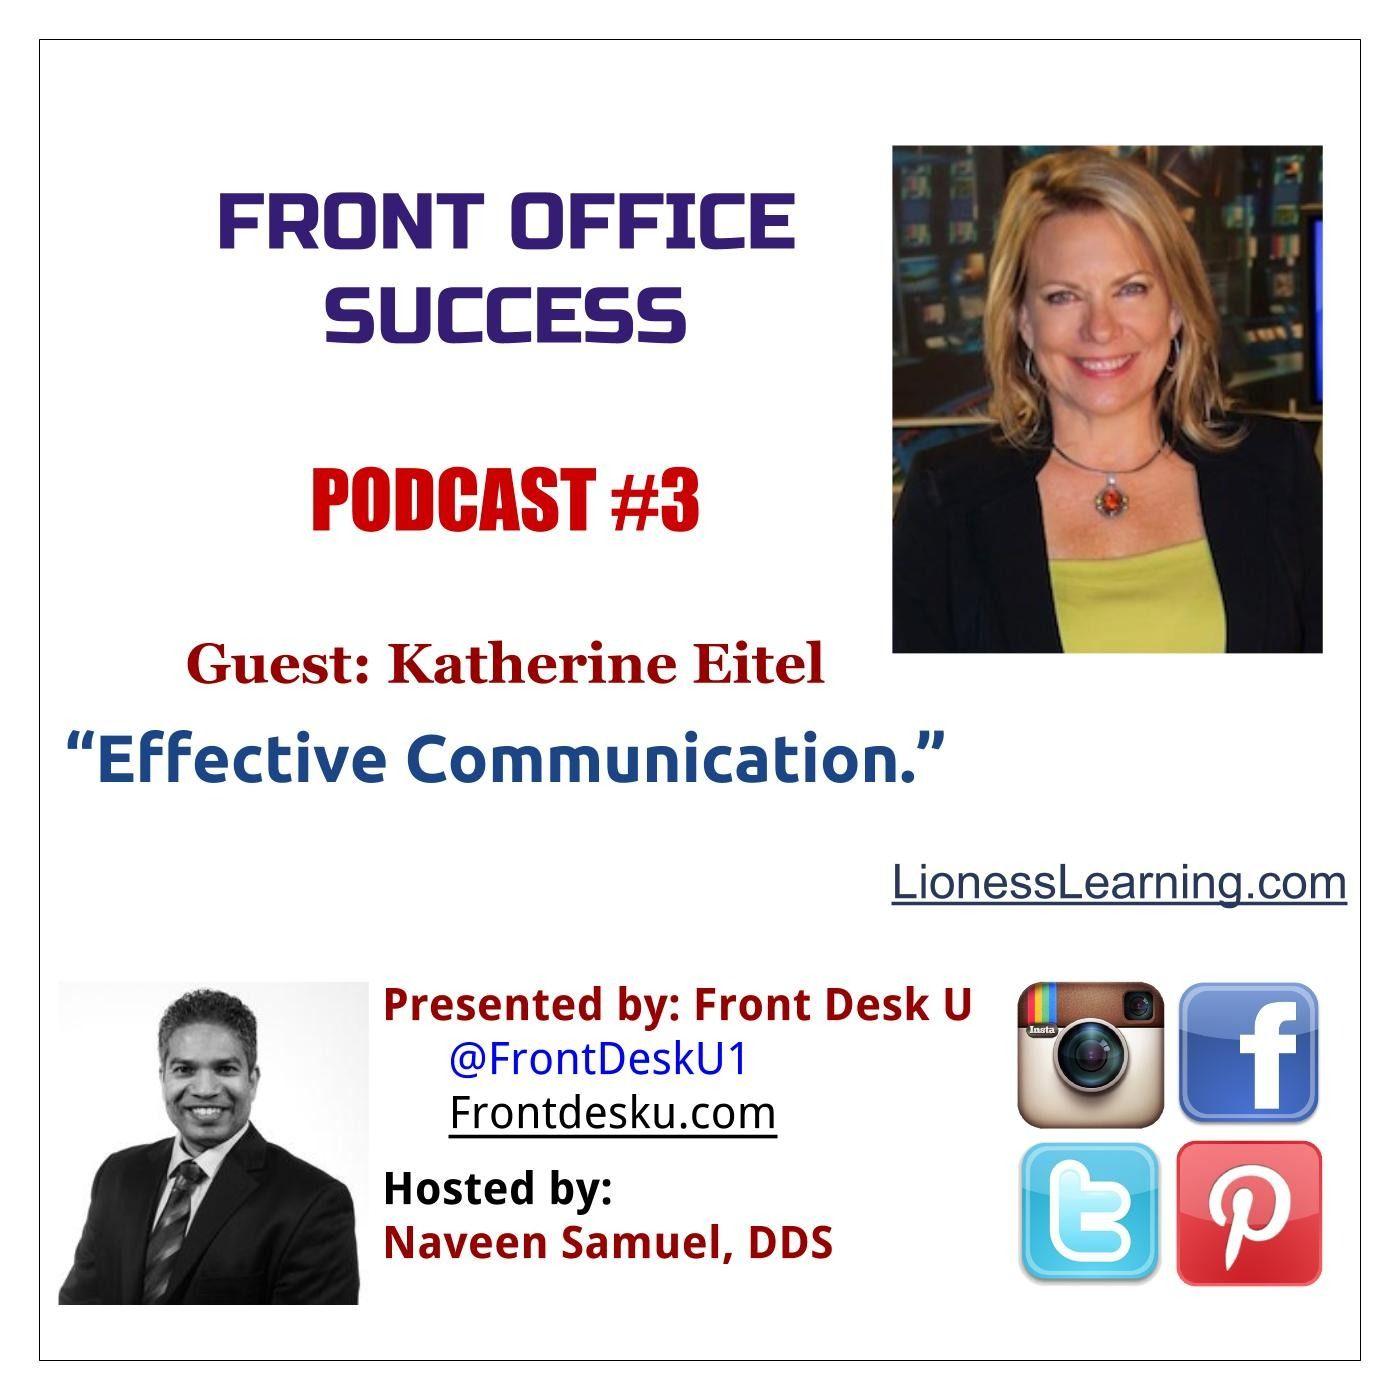 Front Office Success - Podcast #3 - Katherine Eitel